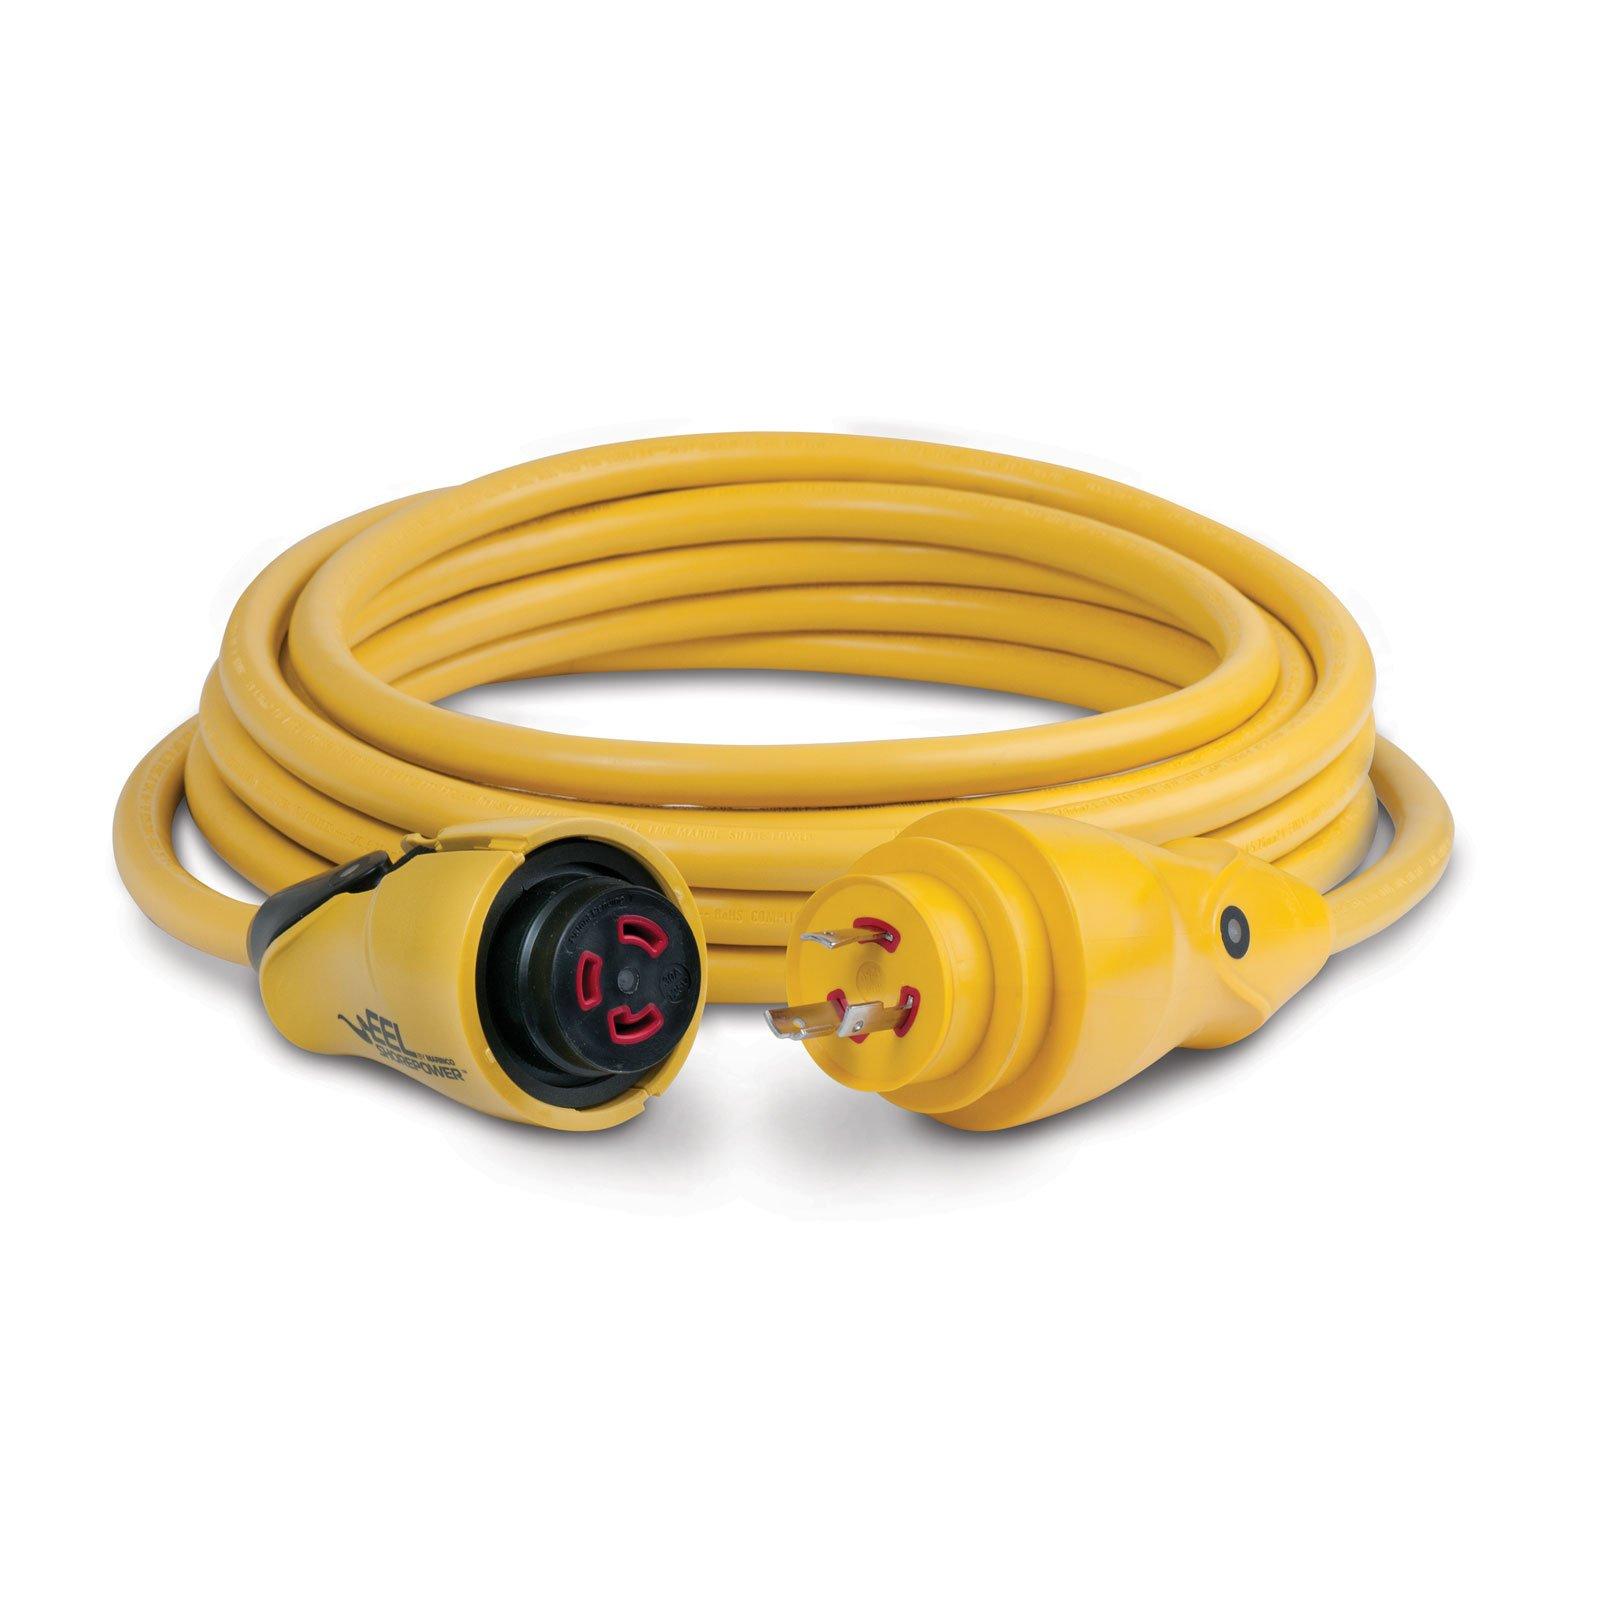 Marinco EEL 30-Amp 125-Volt Cord Set, Yellow, 25-Feet by Marinco